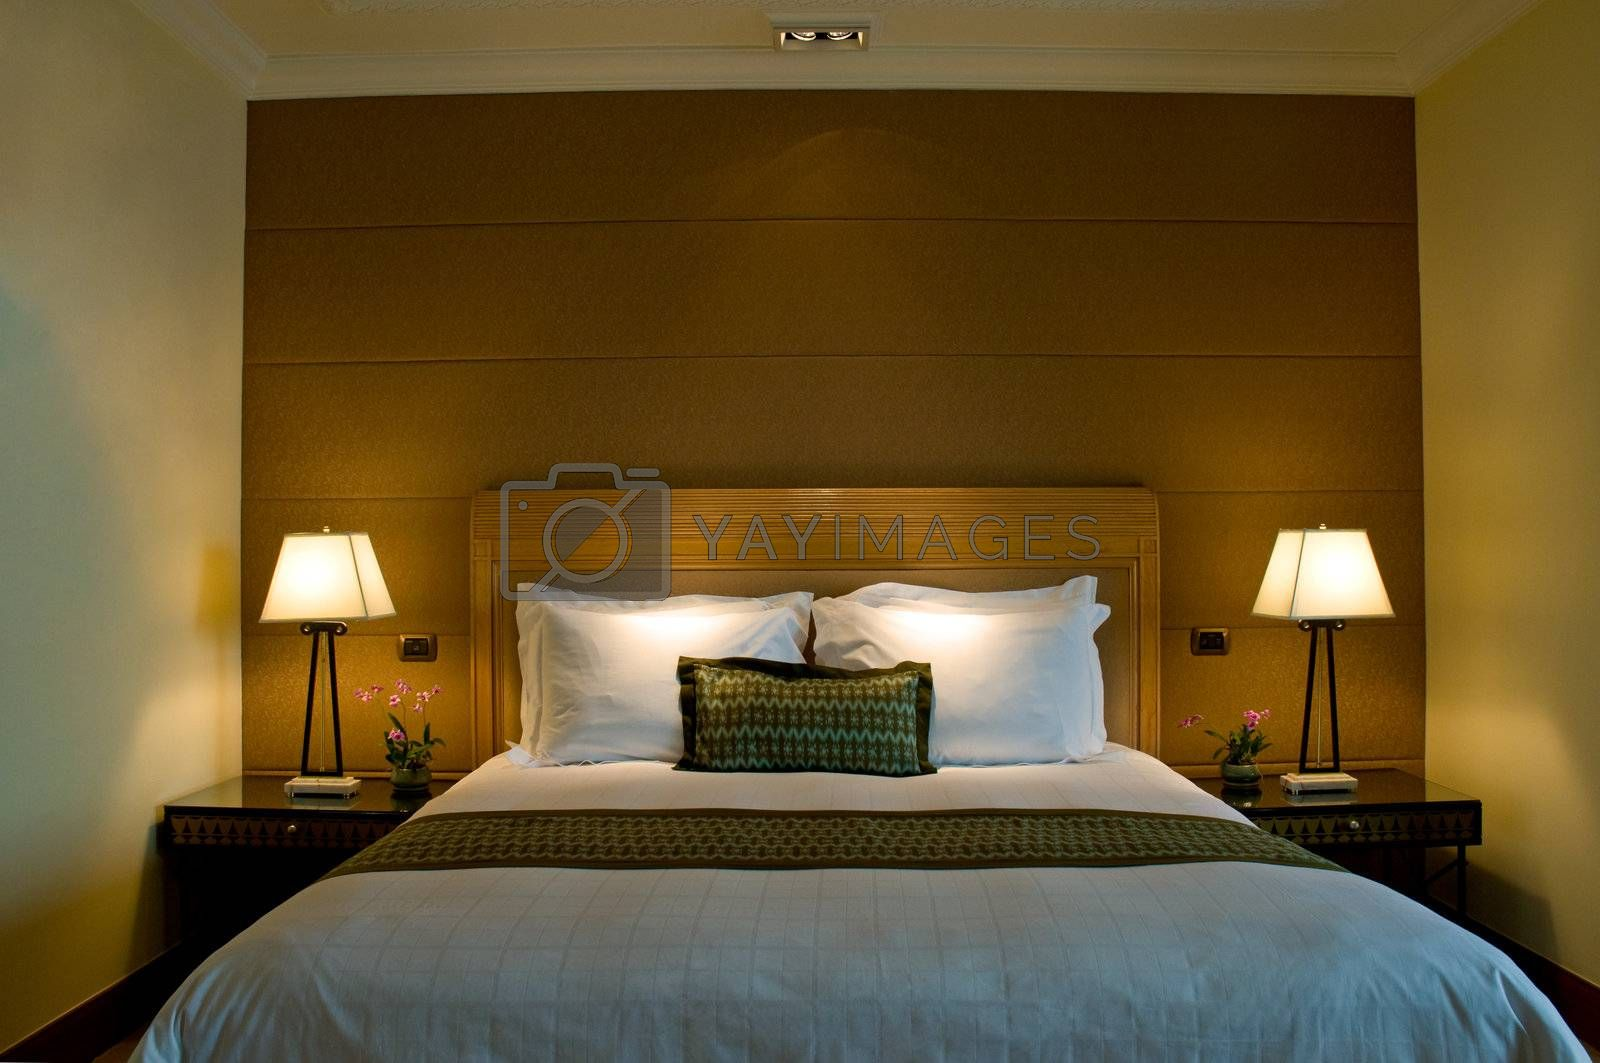 Bedroom of a elegant 5 star luxury hotel